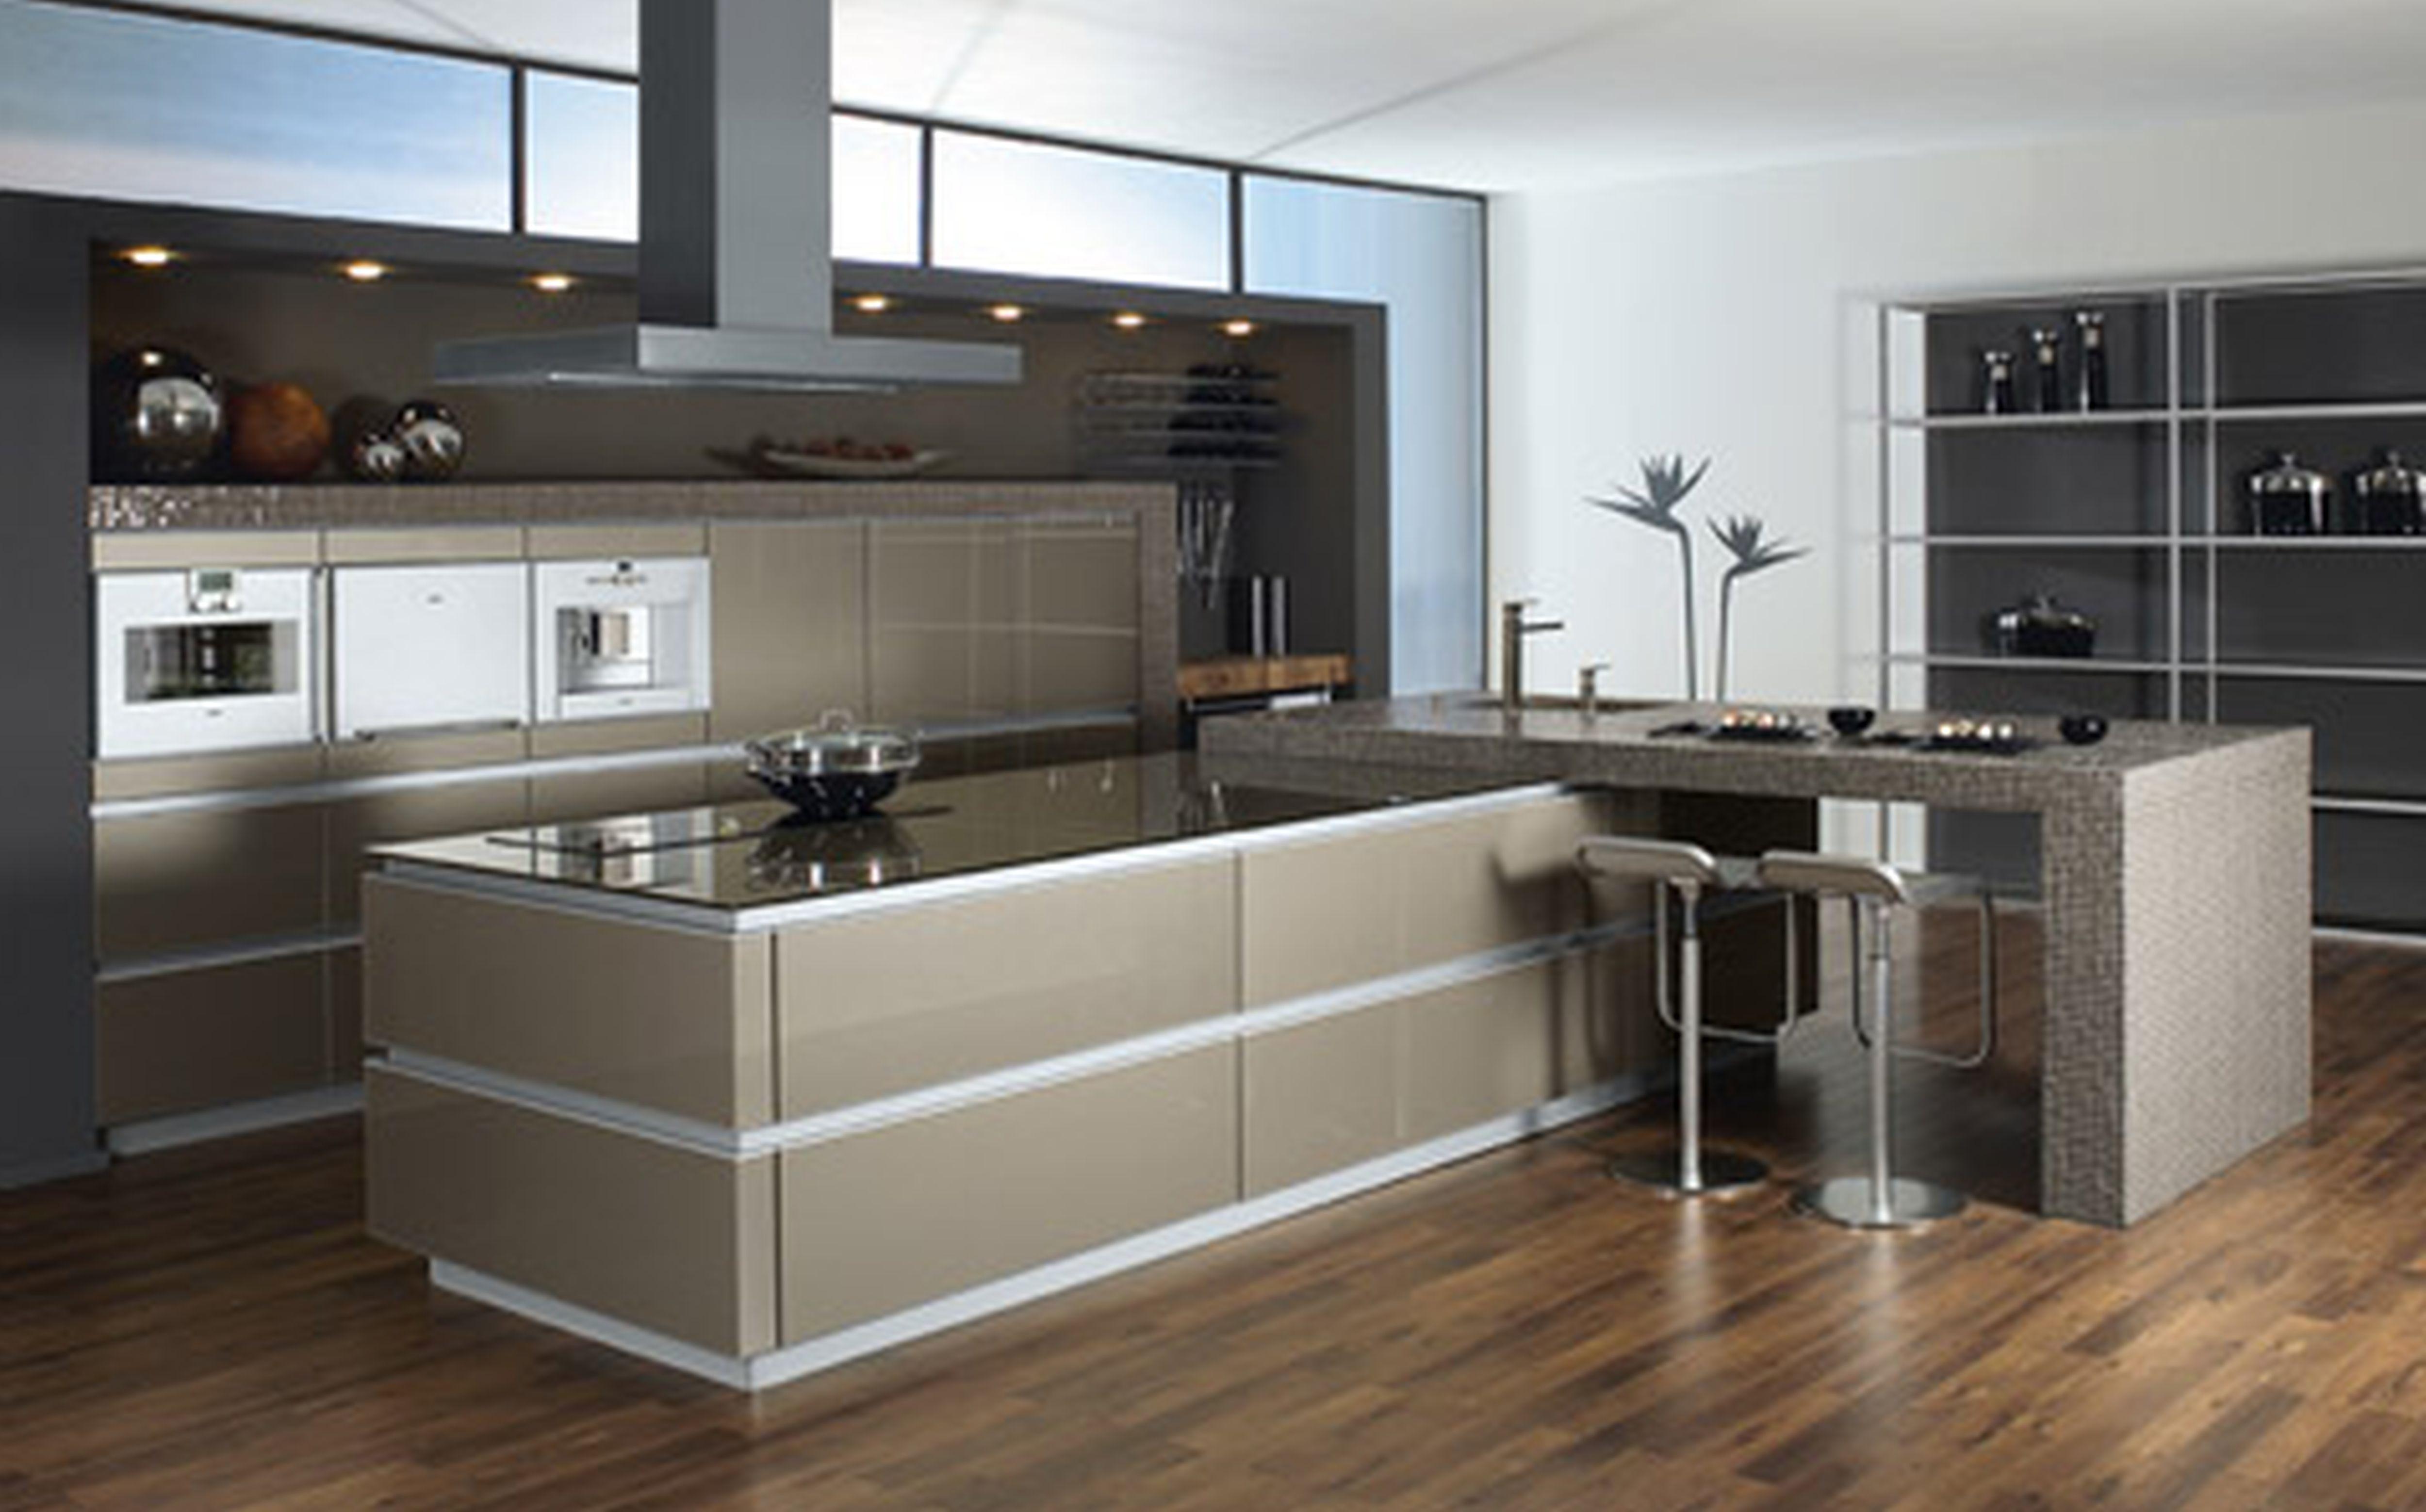 awesome modern kitchen cabinets red | 35 Modern Kitchen Design Inspiration | Wow Decor